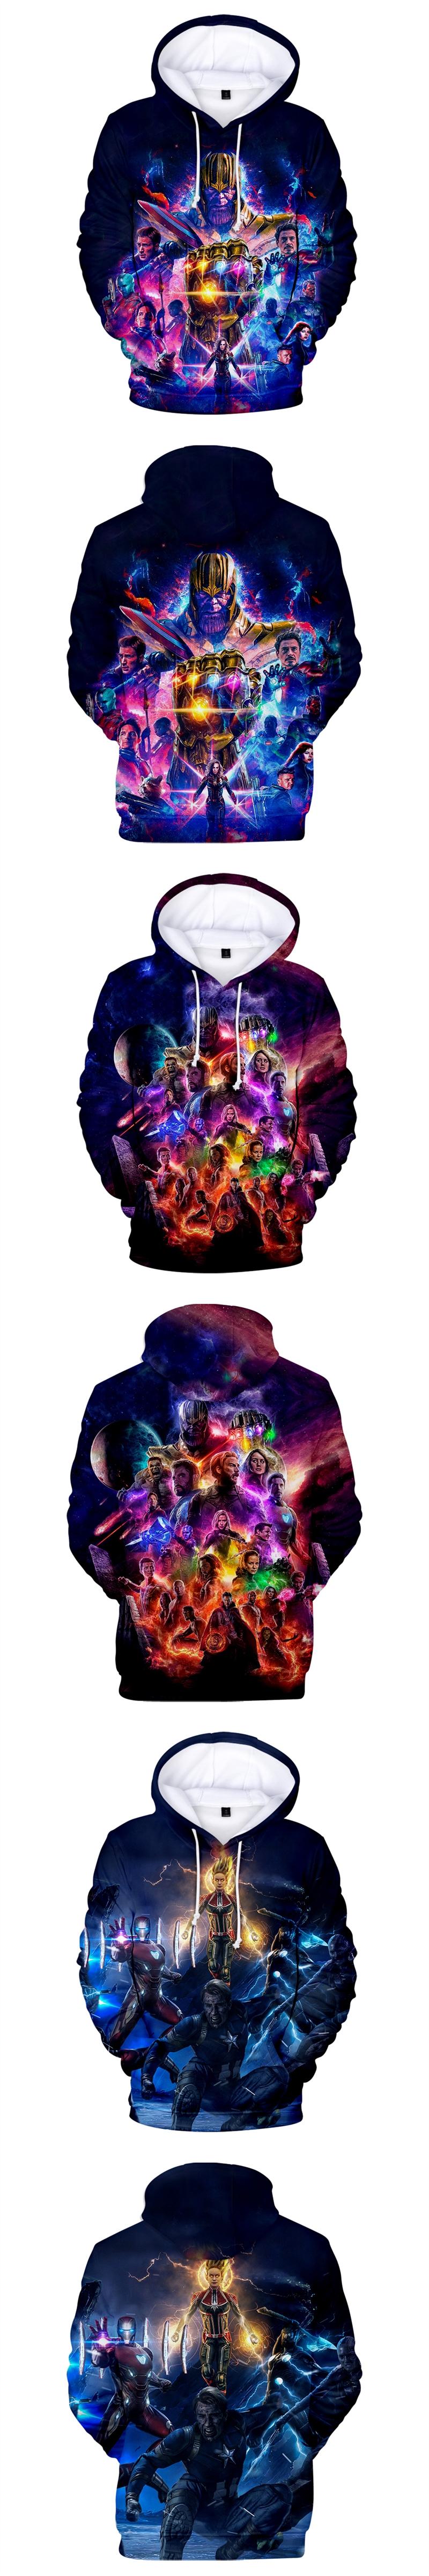 Espero su respuesta ประหลาดใจกับเสื้อสเว็ตใหม่หนังเวนเจอร์ส endgame ซิป hoodies